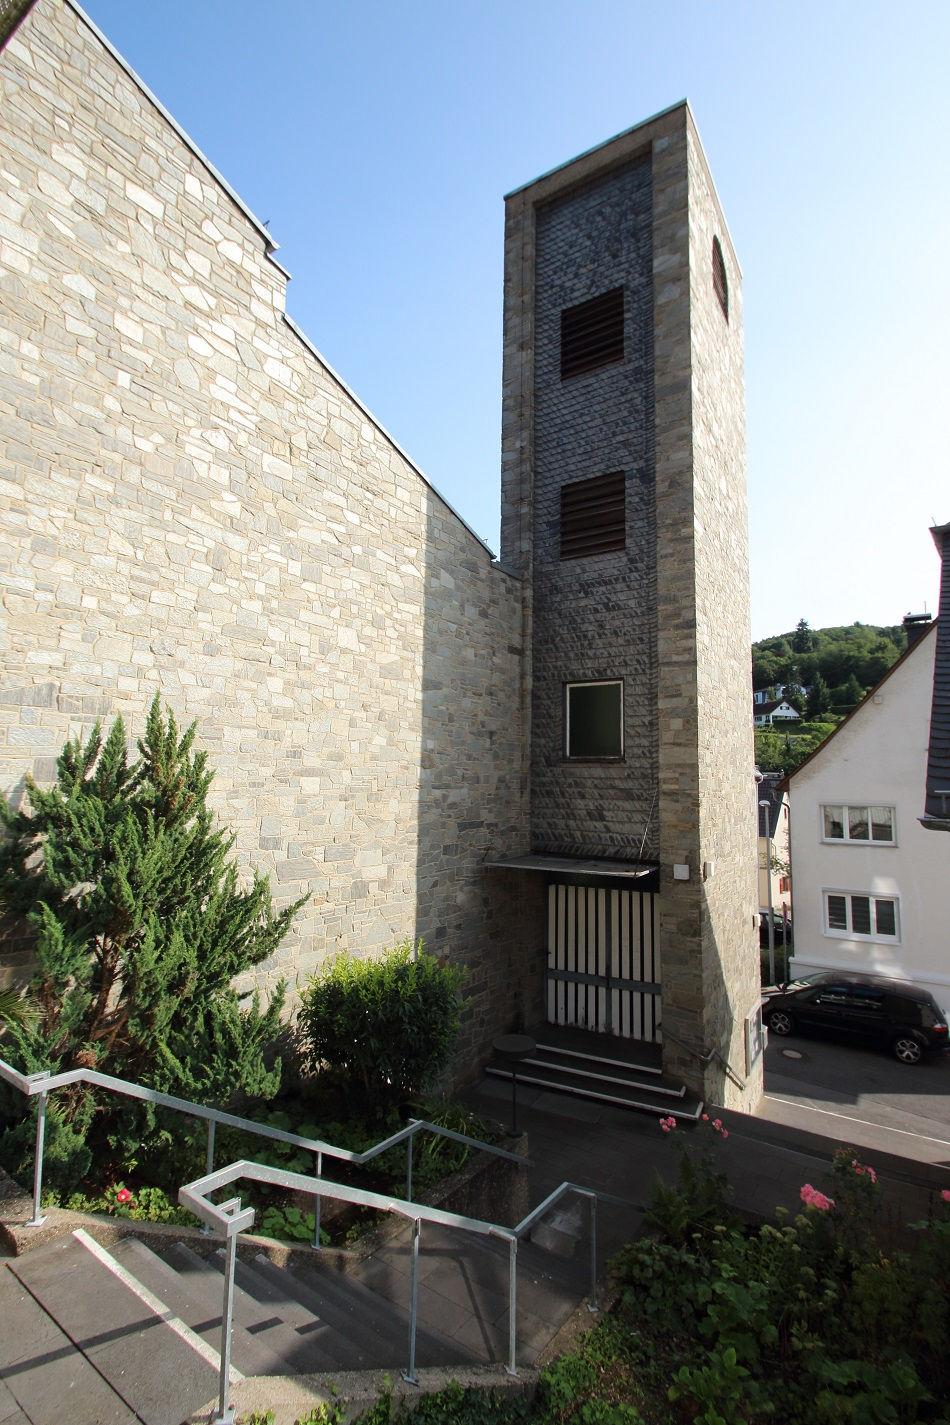 Kirchstraße 36, 65344 Eltville-Martinsthal, ,Kirchen,geschlossen,Kirchstraße,2374